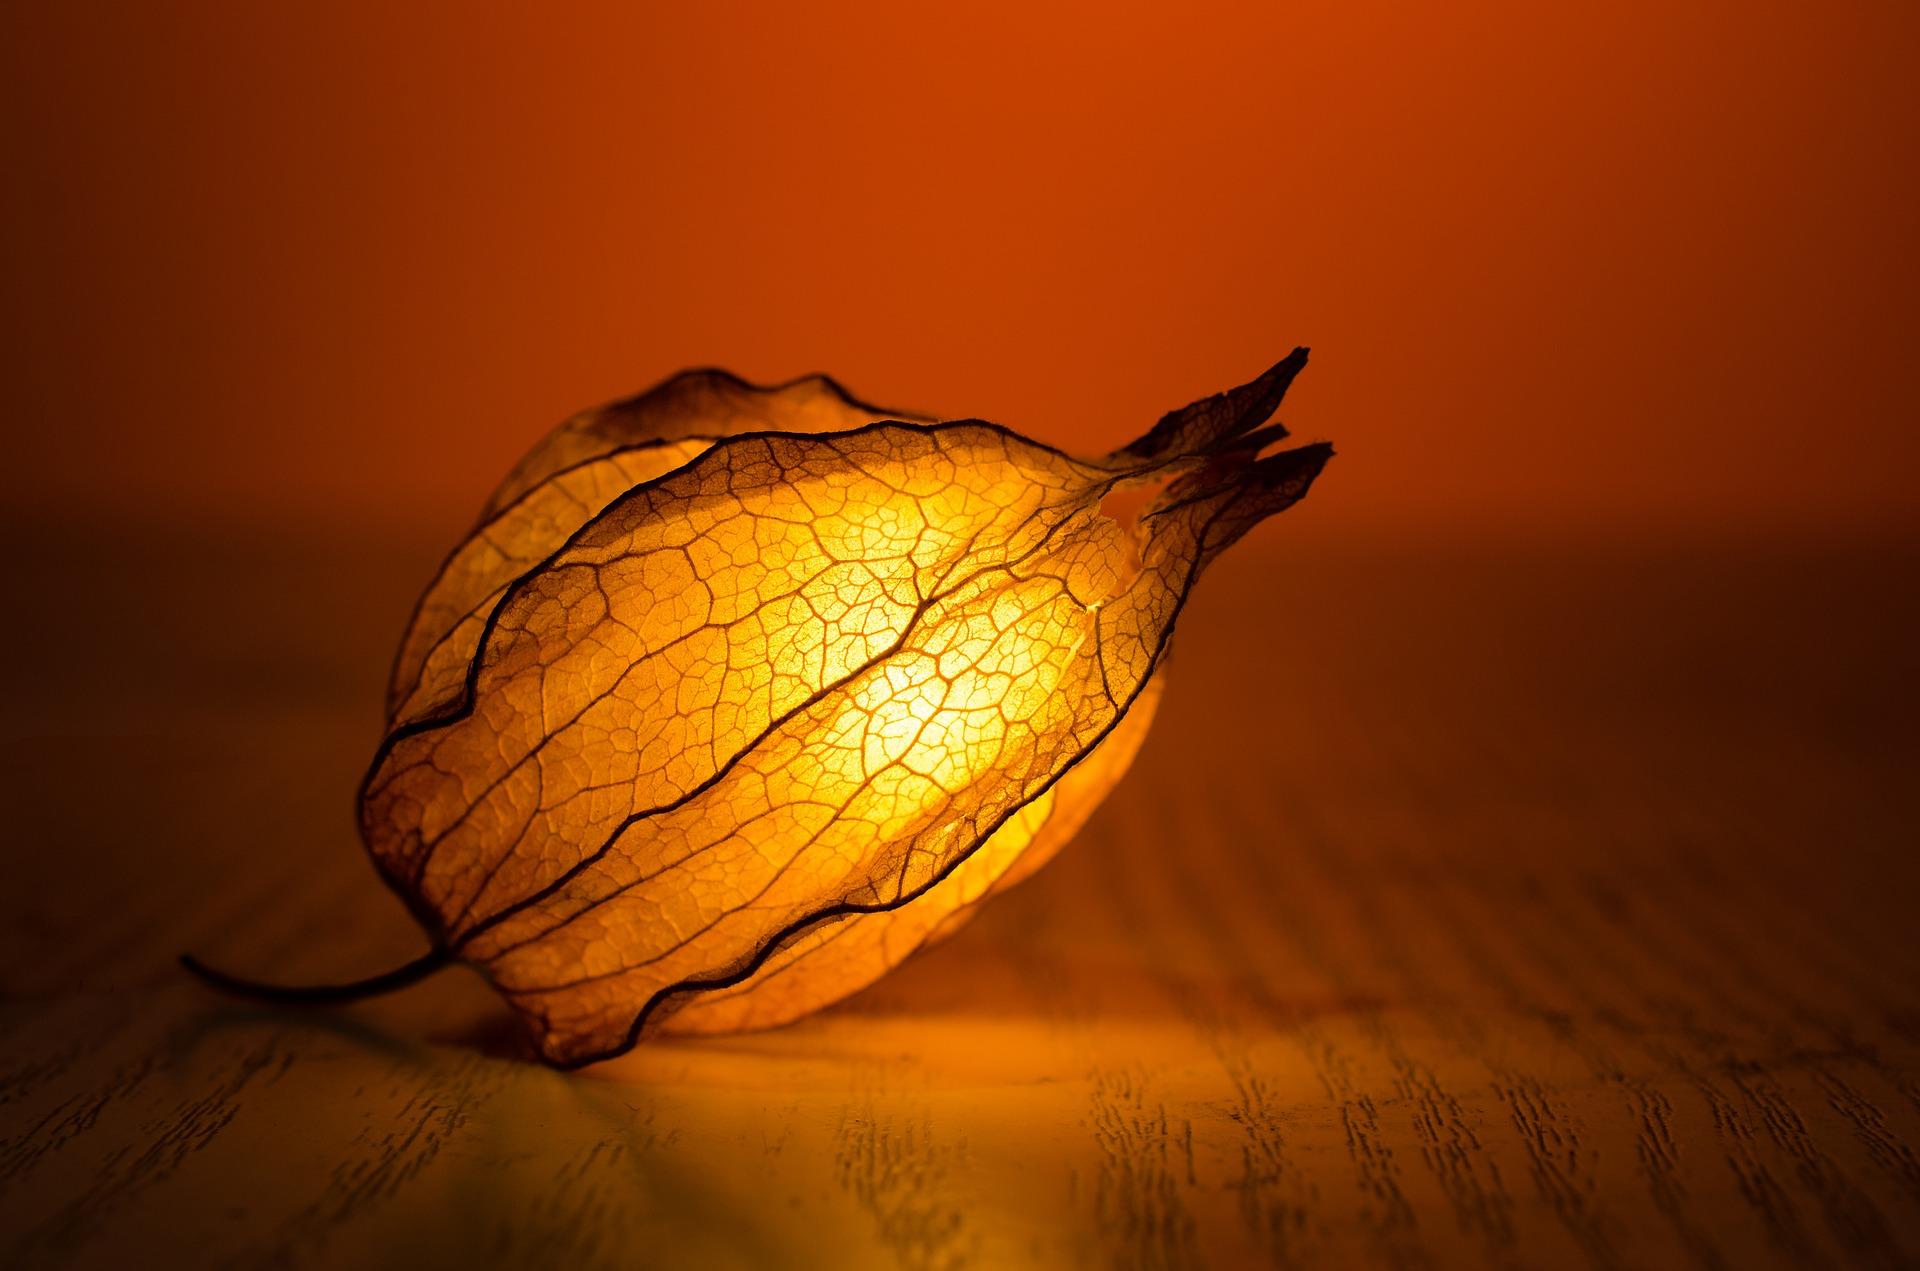 The Glow Flower